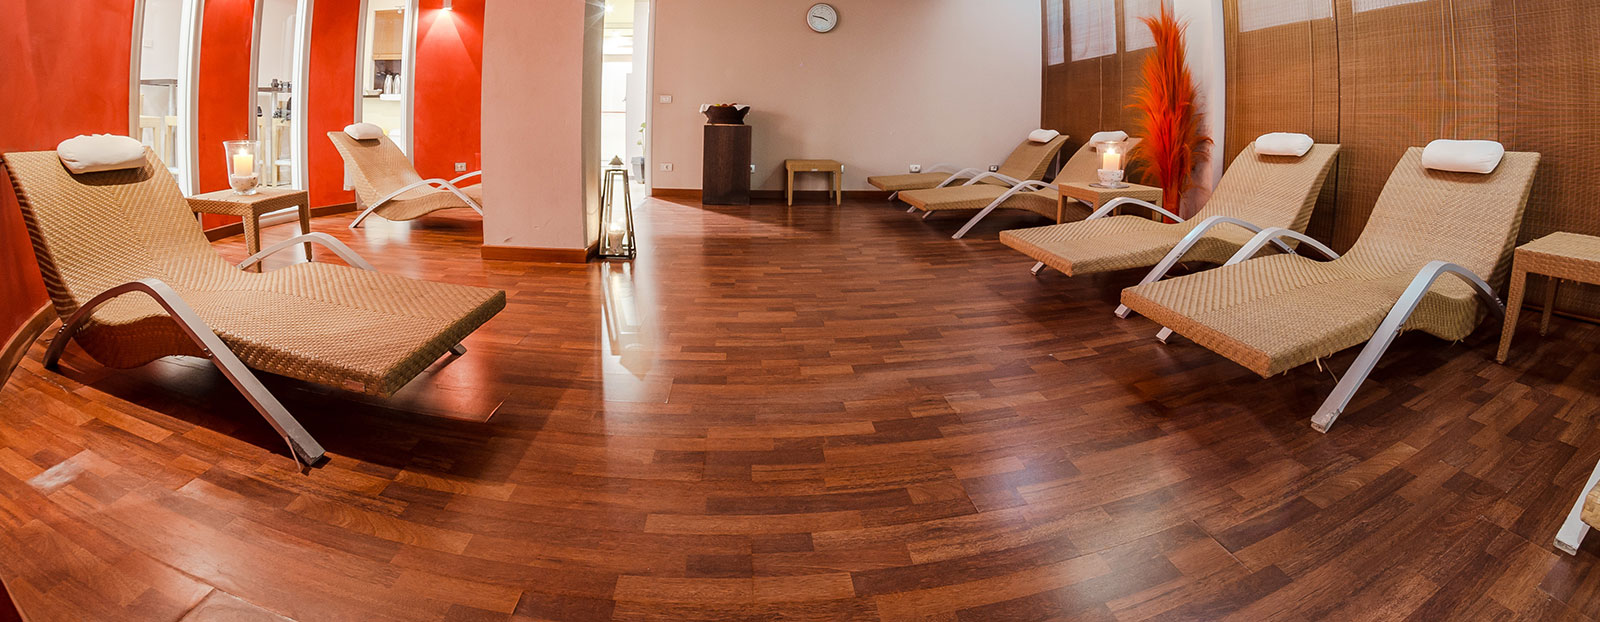 skiuma-testata-relax